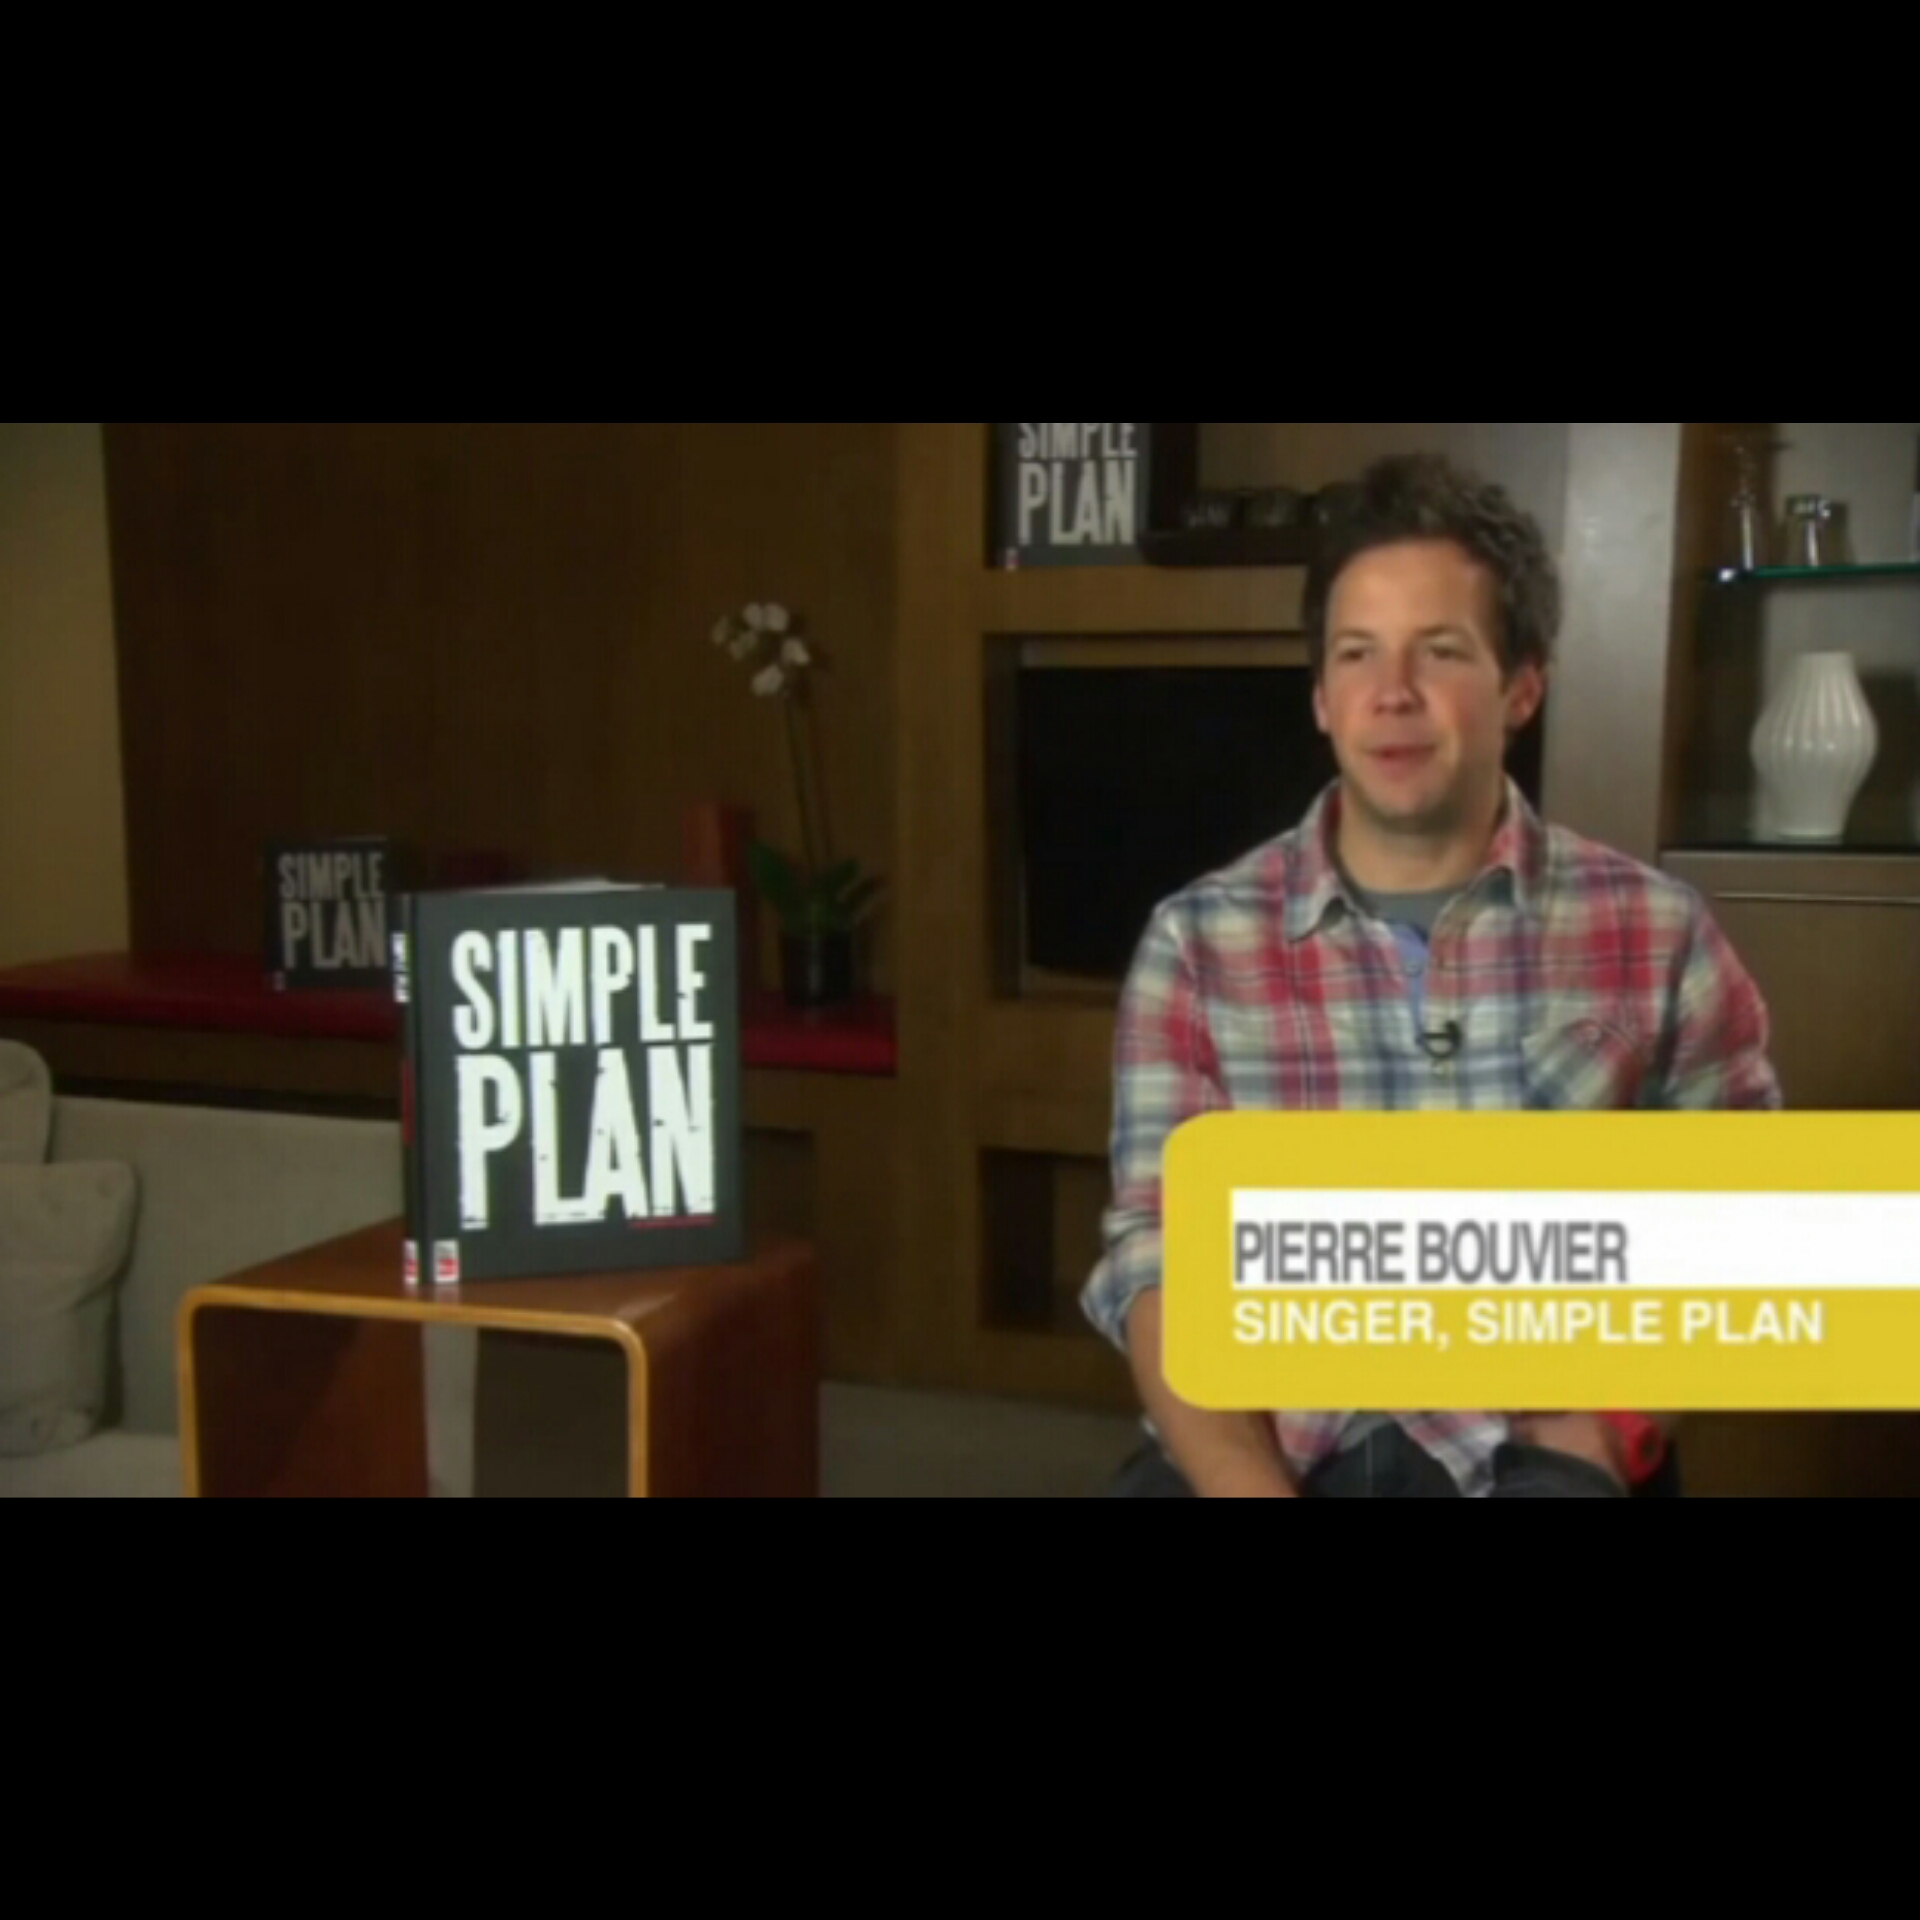 Simple Plan - Pierre Bouvier